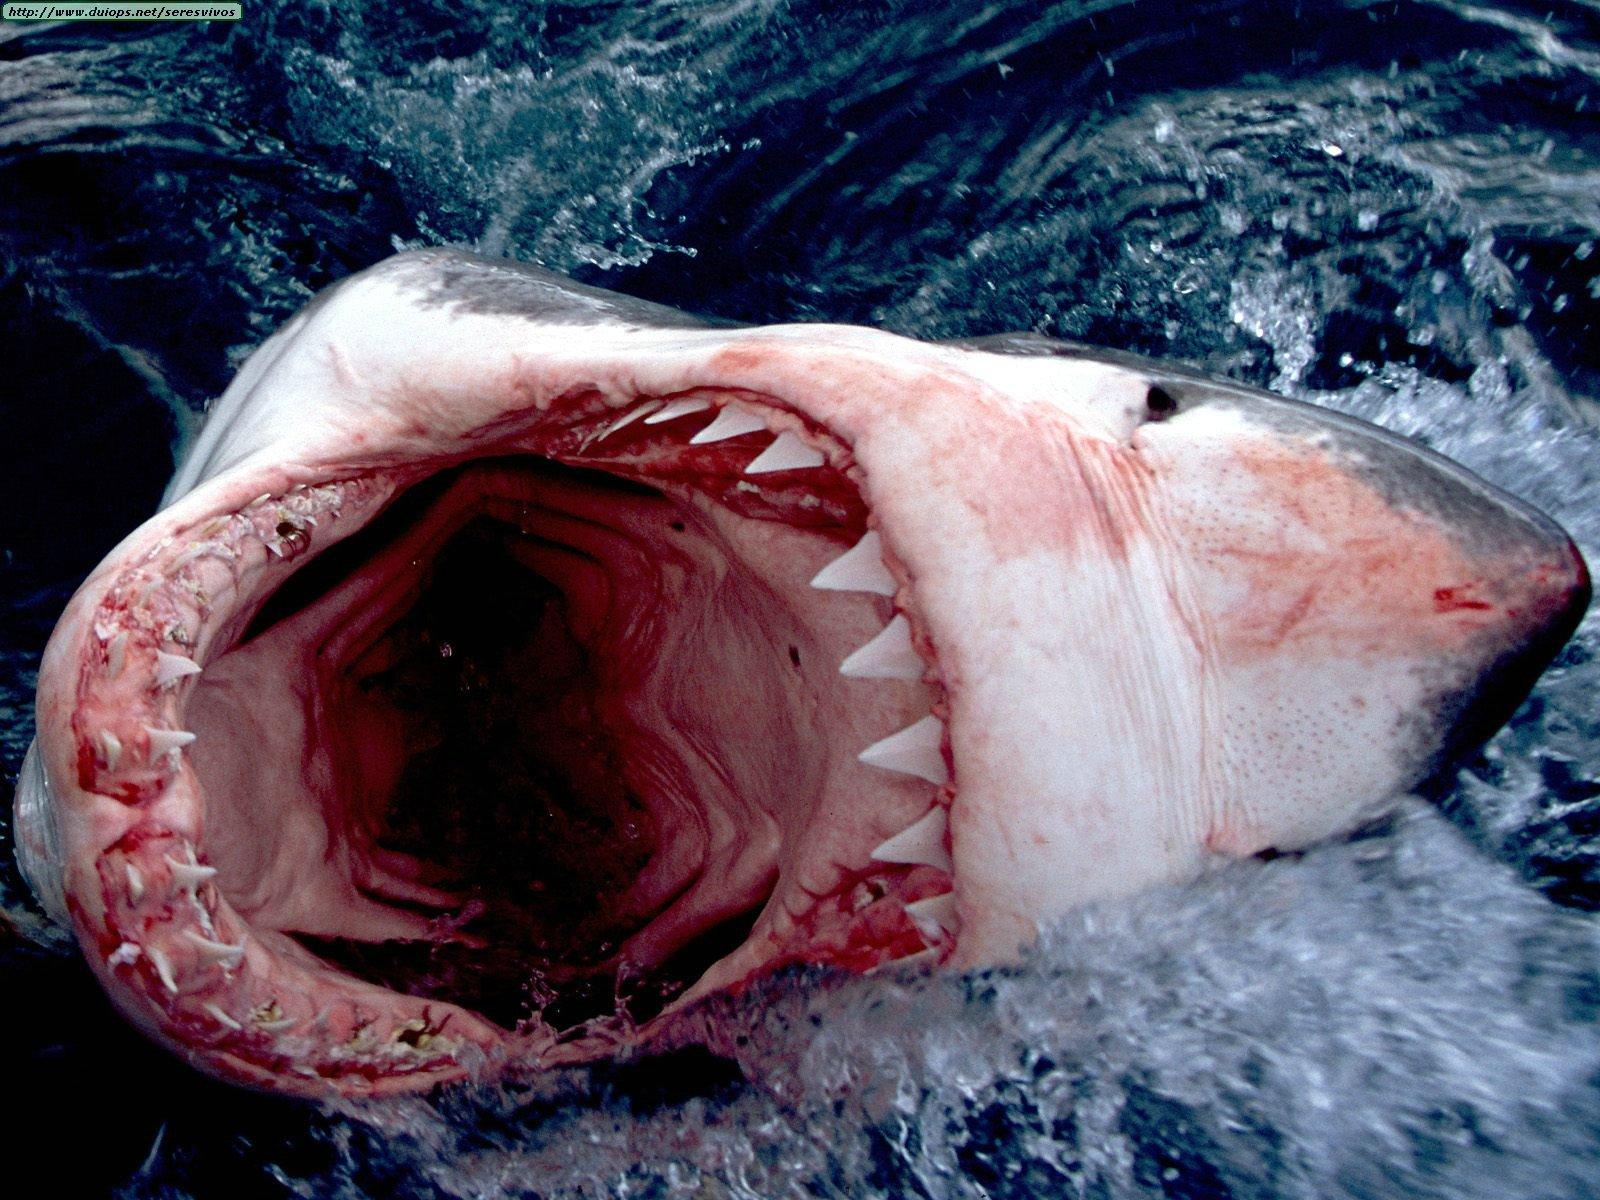 Angelina Jolie Fans February 2011 Kaos Fish Ikan Hiu Shark Serangan Terjadi Kamis 17 2 Pekan Lalu Di Dekat Permukaan Perairan Yang Terletak 15 Mil Sebelah Barat Coffin Bay National Park Putih Memang